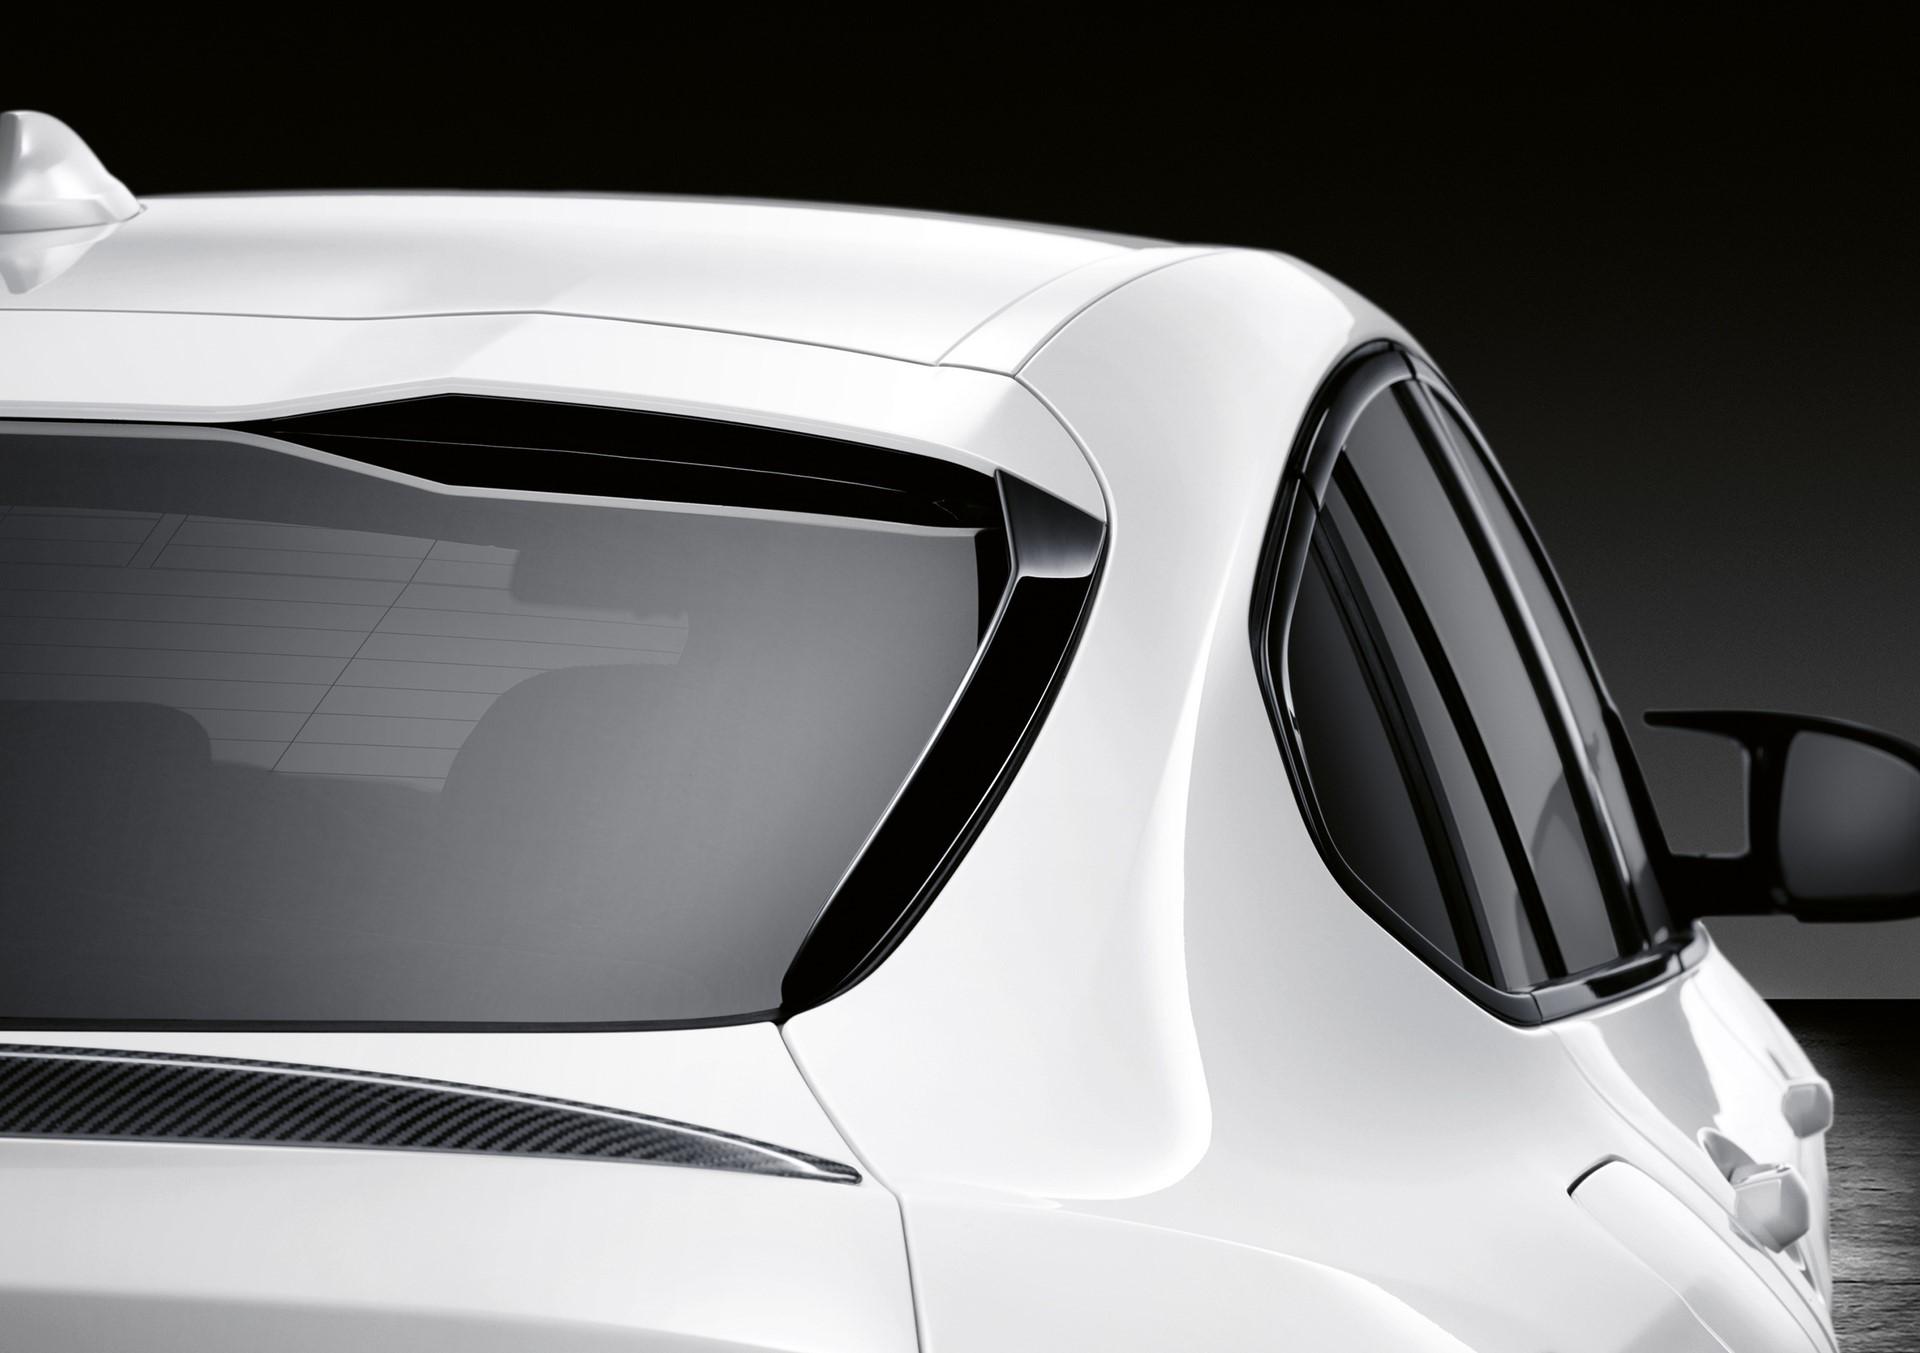 BMW-X3-M-and-BMW-X4-M-M-Performance-Parts-4